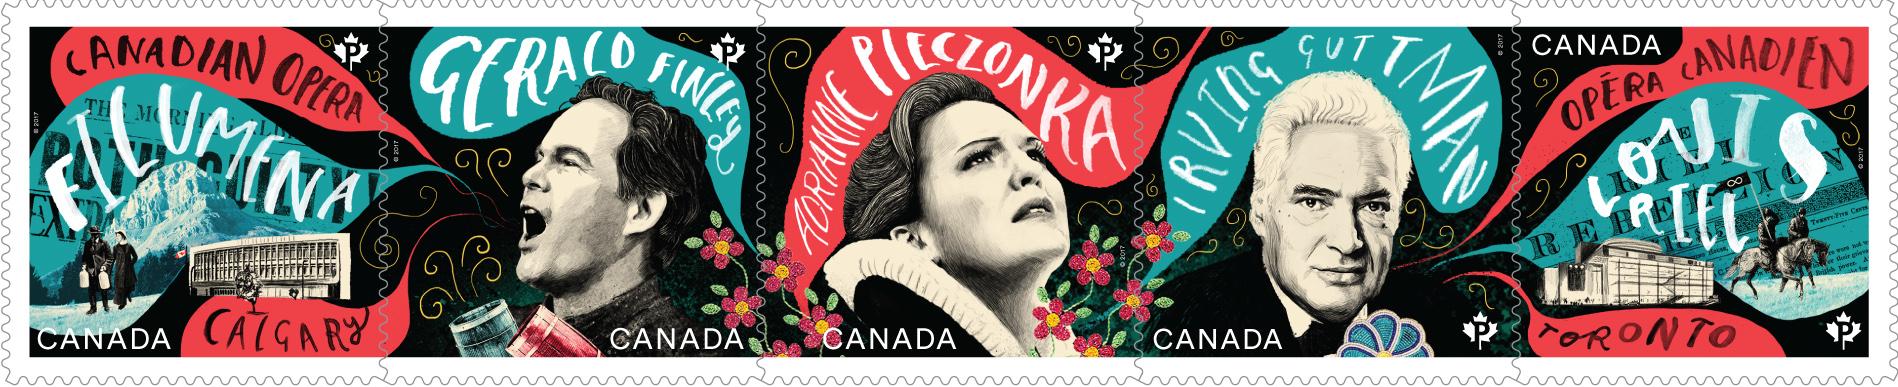 Canadian Opera: Souvenir Sheet